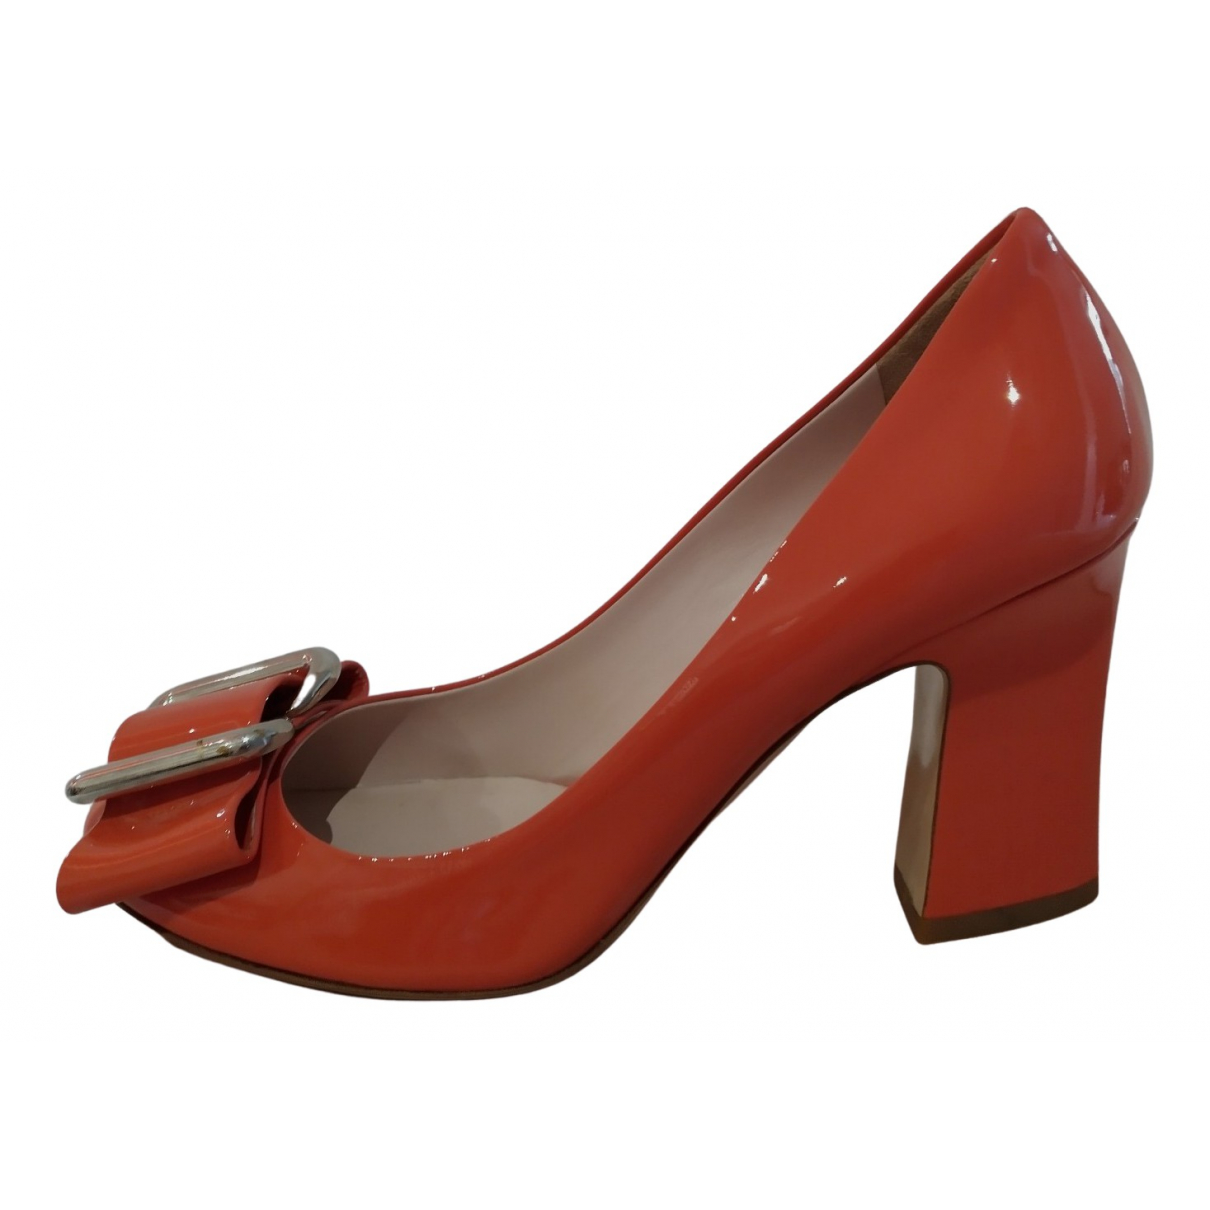 Miu Miu N Orange Patent leather Heels for Women 38.5 IT